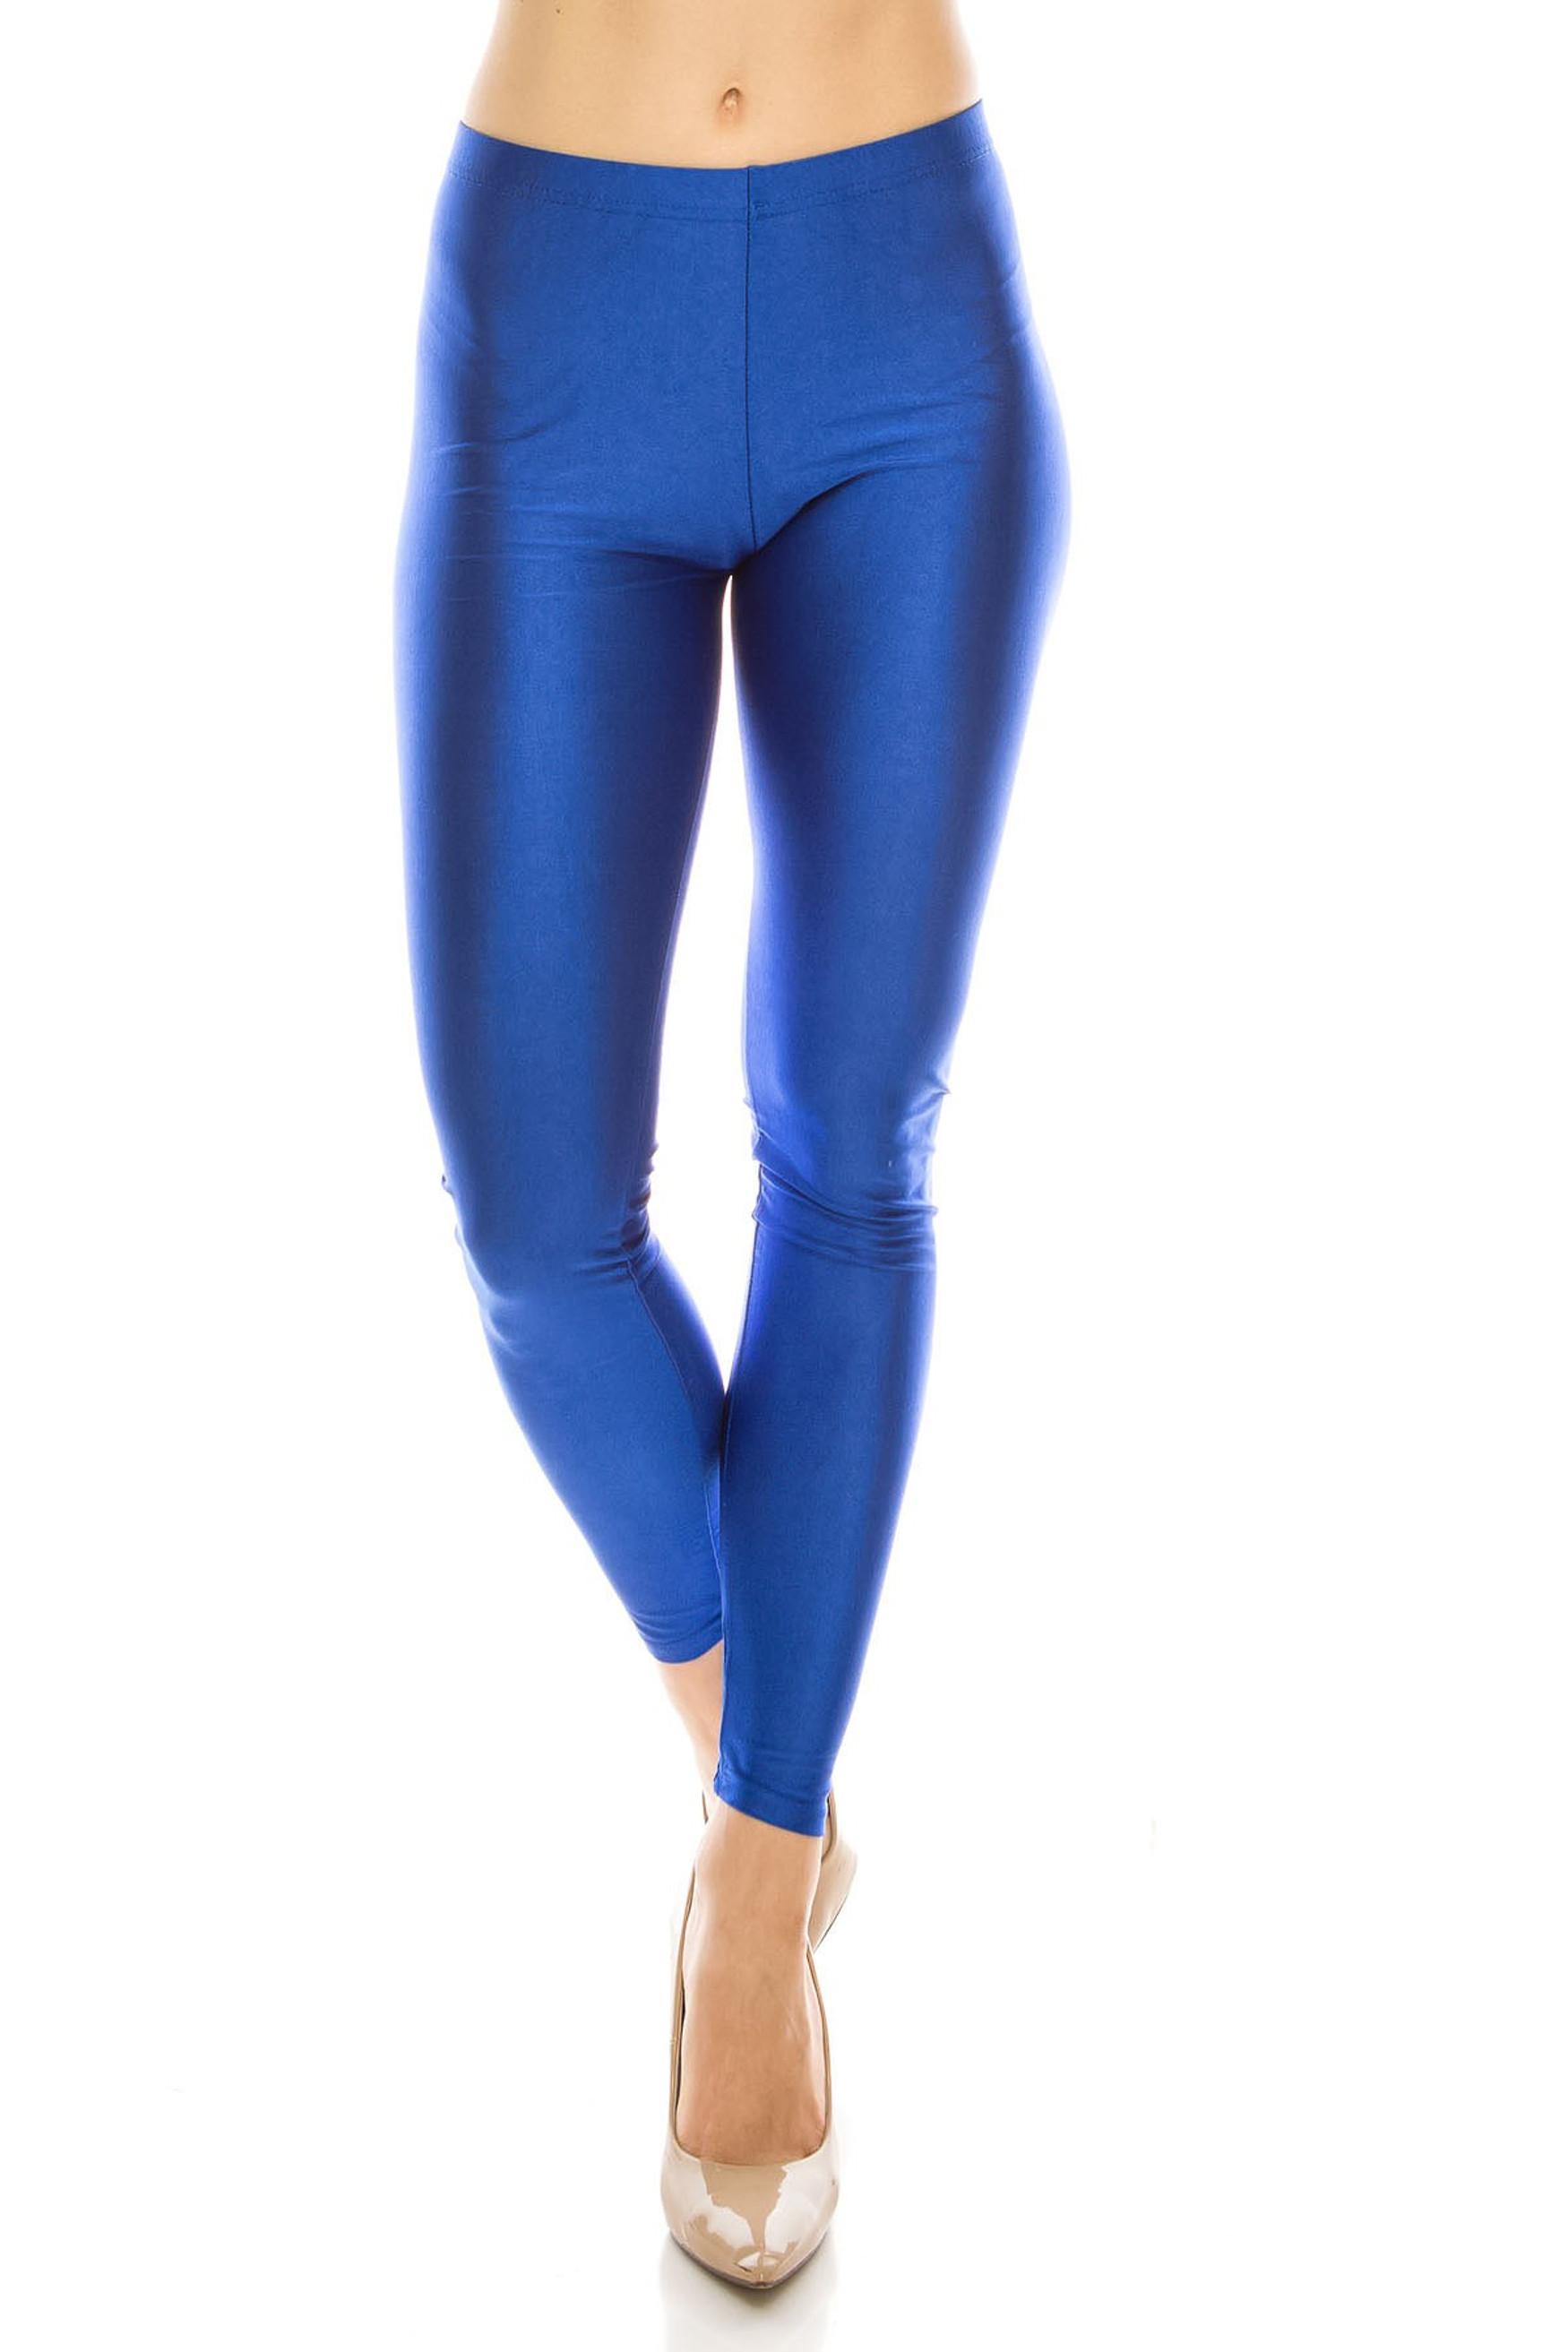 Premium Shiny Stretch Leggings